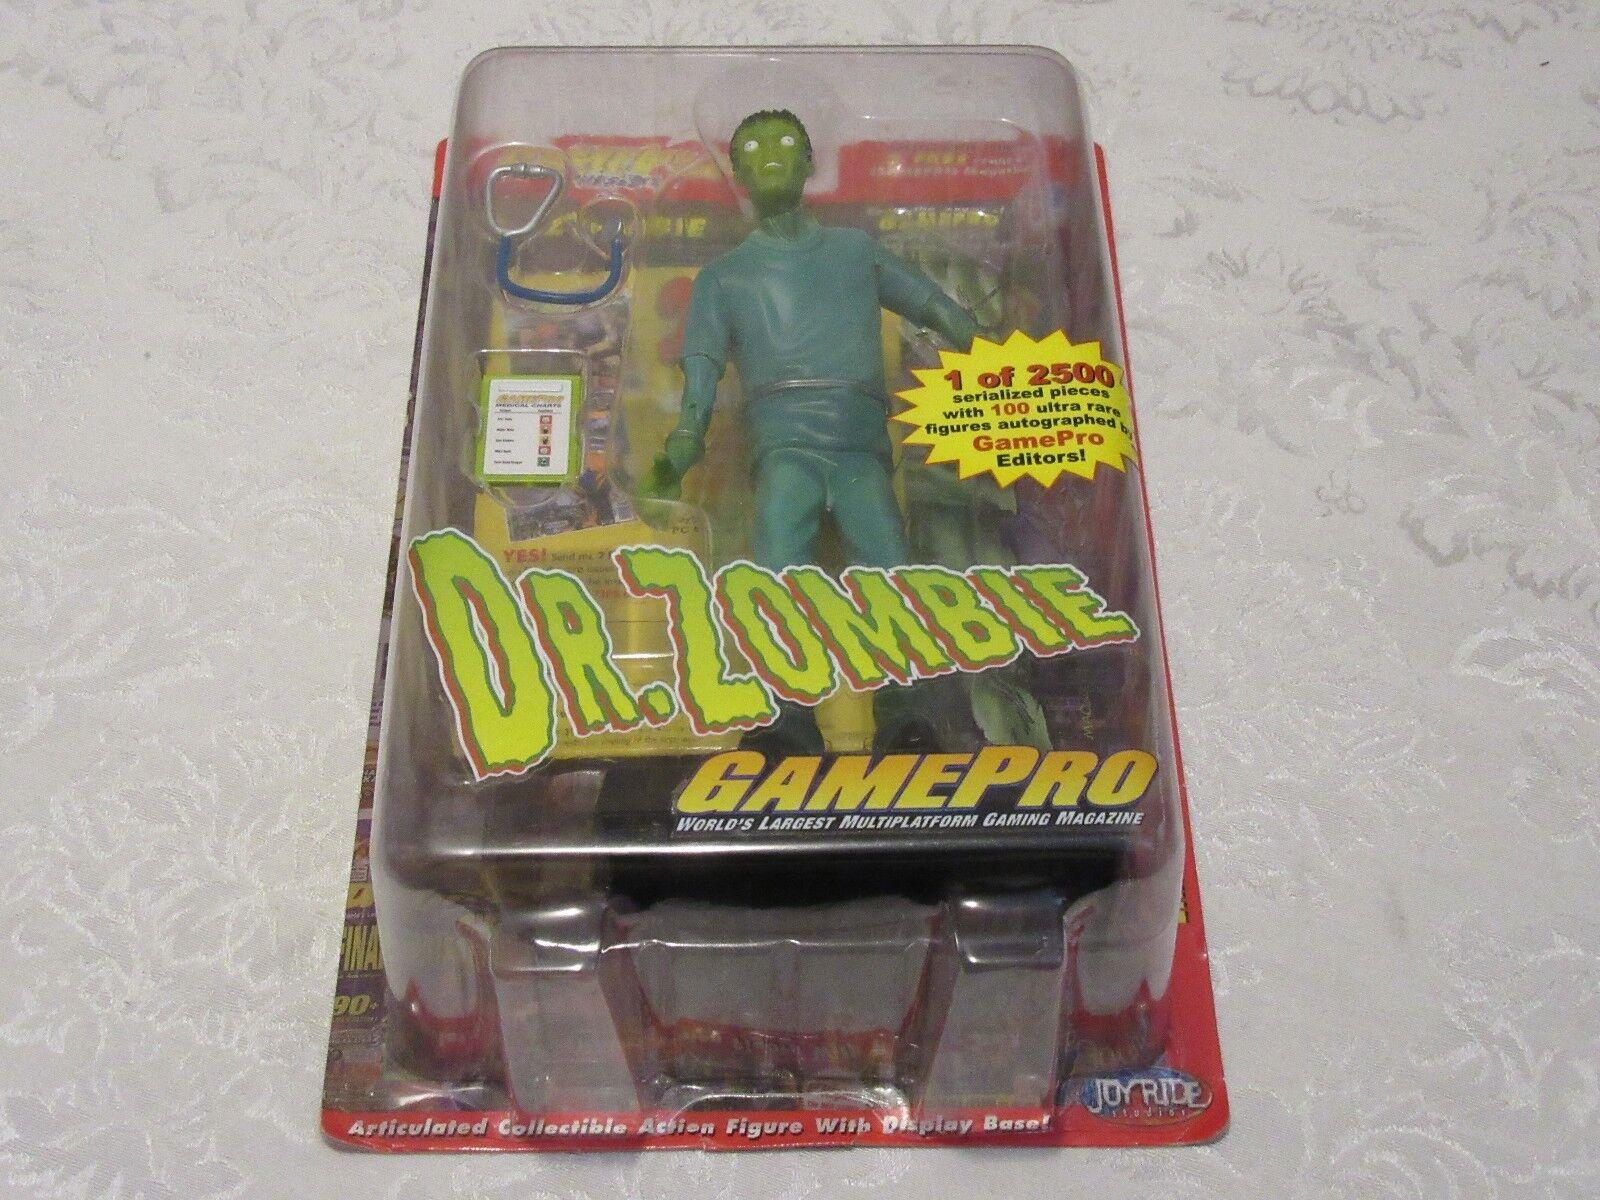 Joyride Studios GamePro Presents Dr Doctor Zombie Series 2 Action Figure